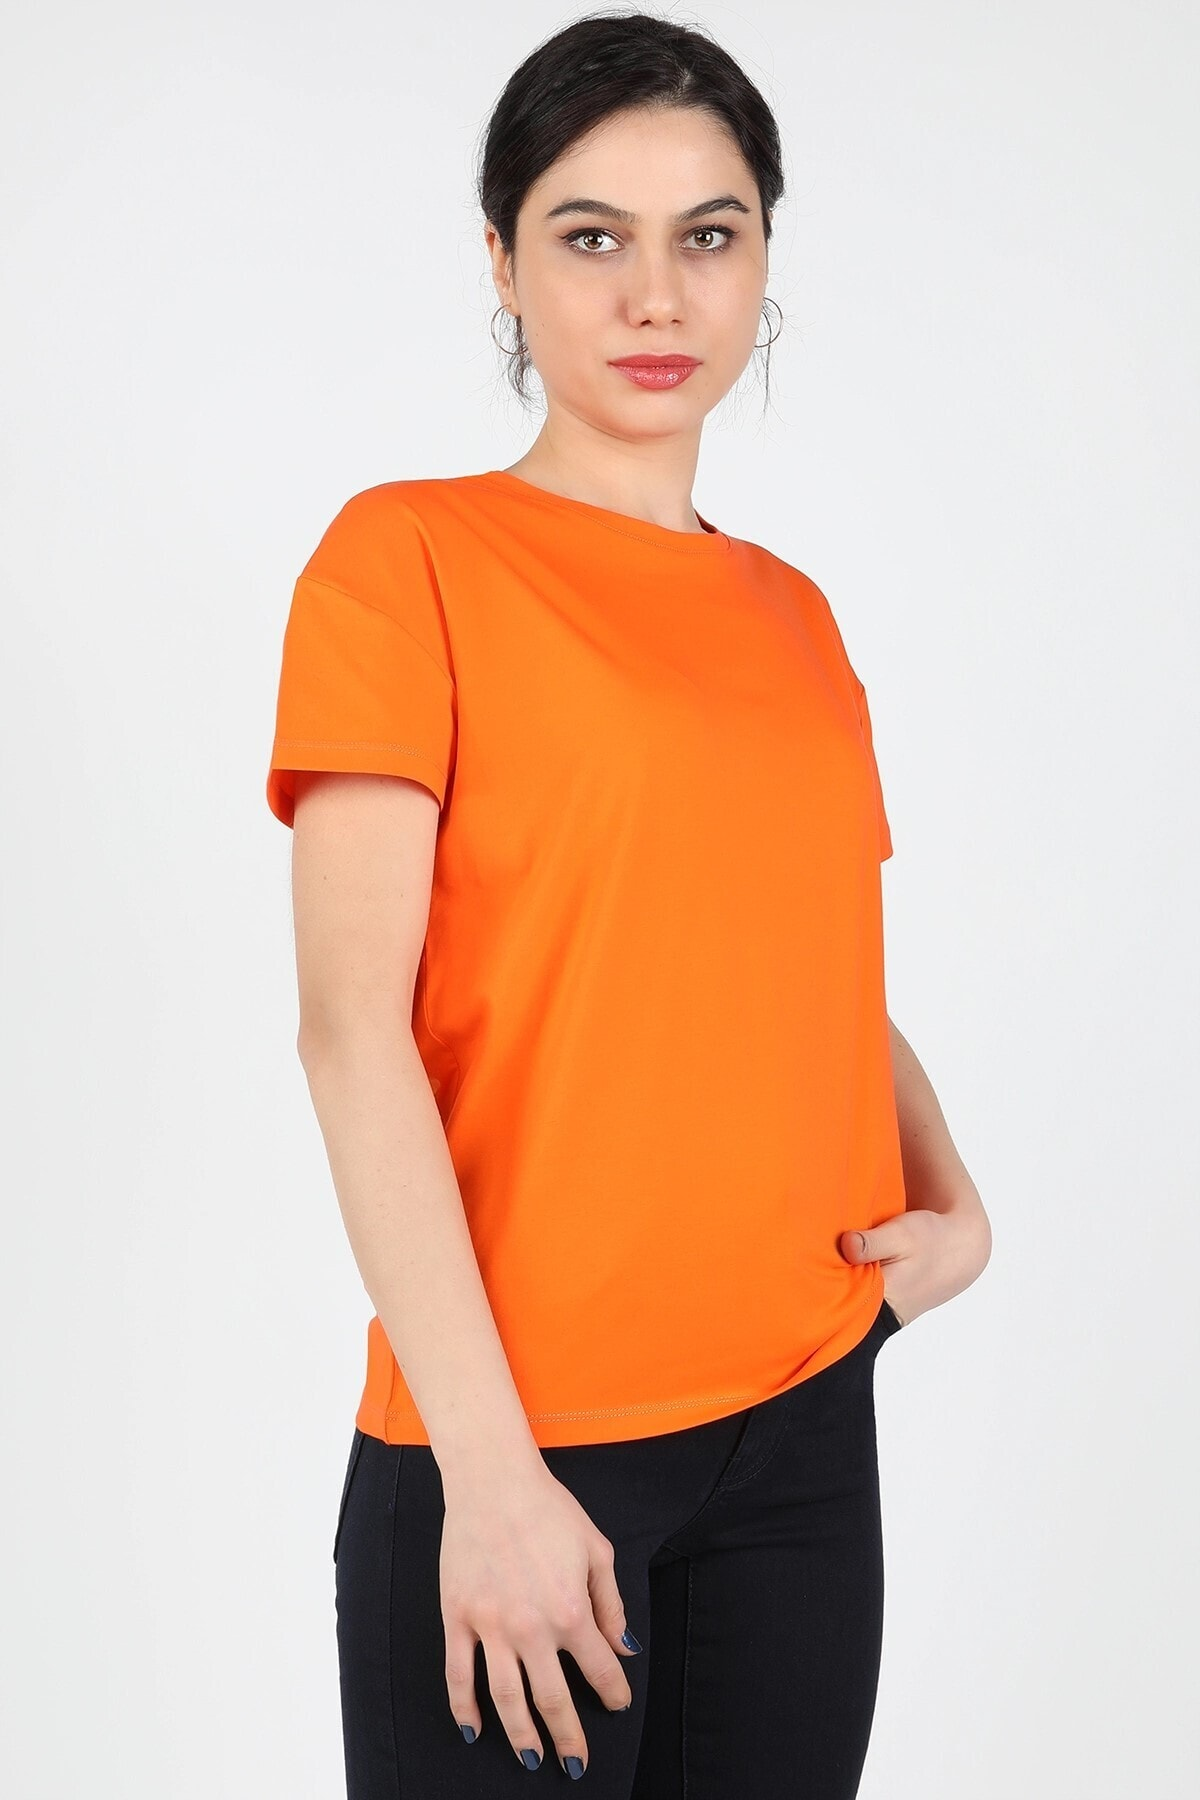 BALİNS Süprem Düşük Kol Tişört Turuncu 2